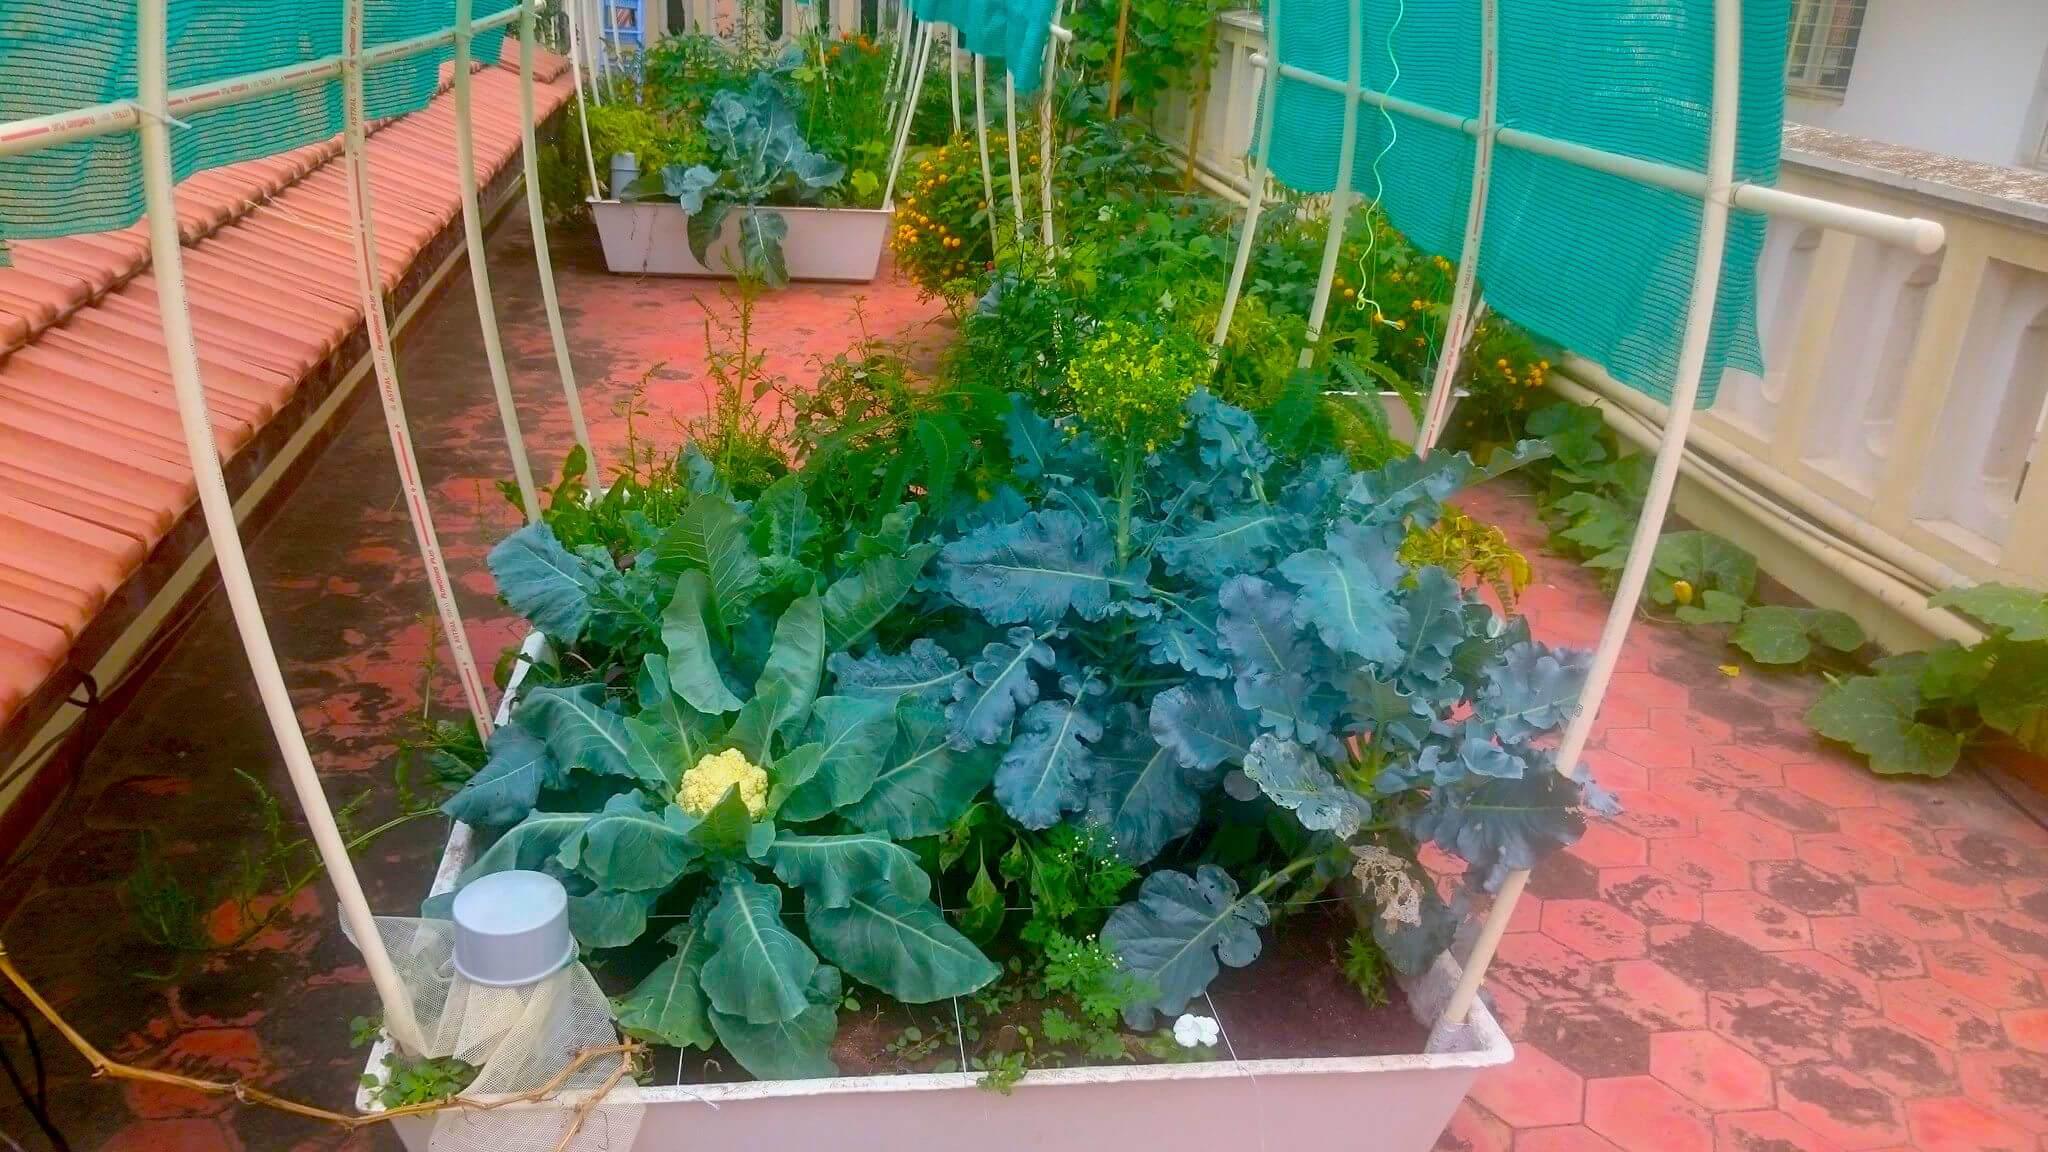 Kitchen Garden Kit Smart Garden Single Complete 24 Sq Ft Self Watering Organic